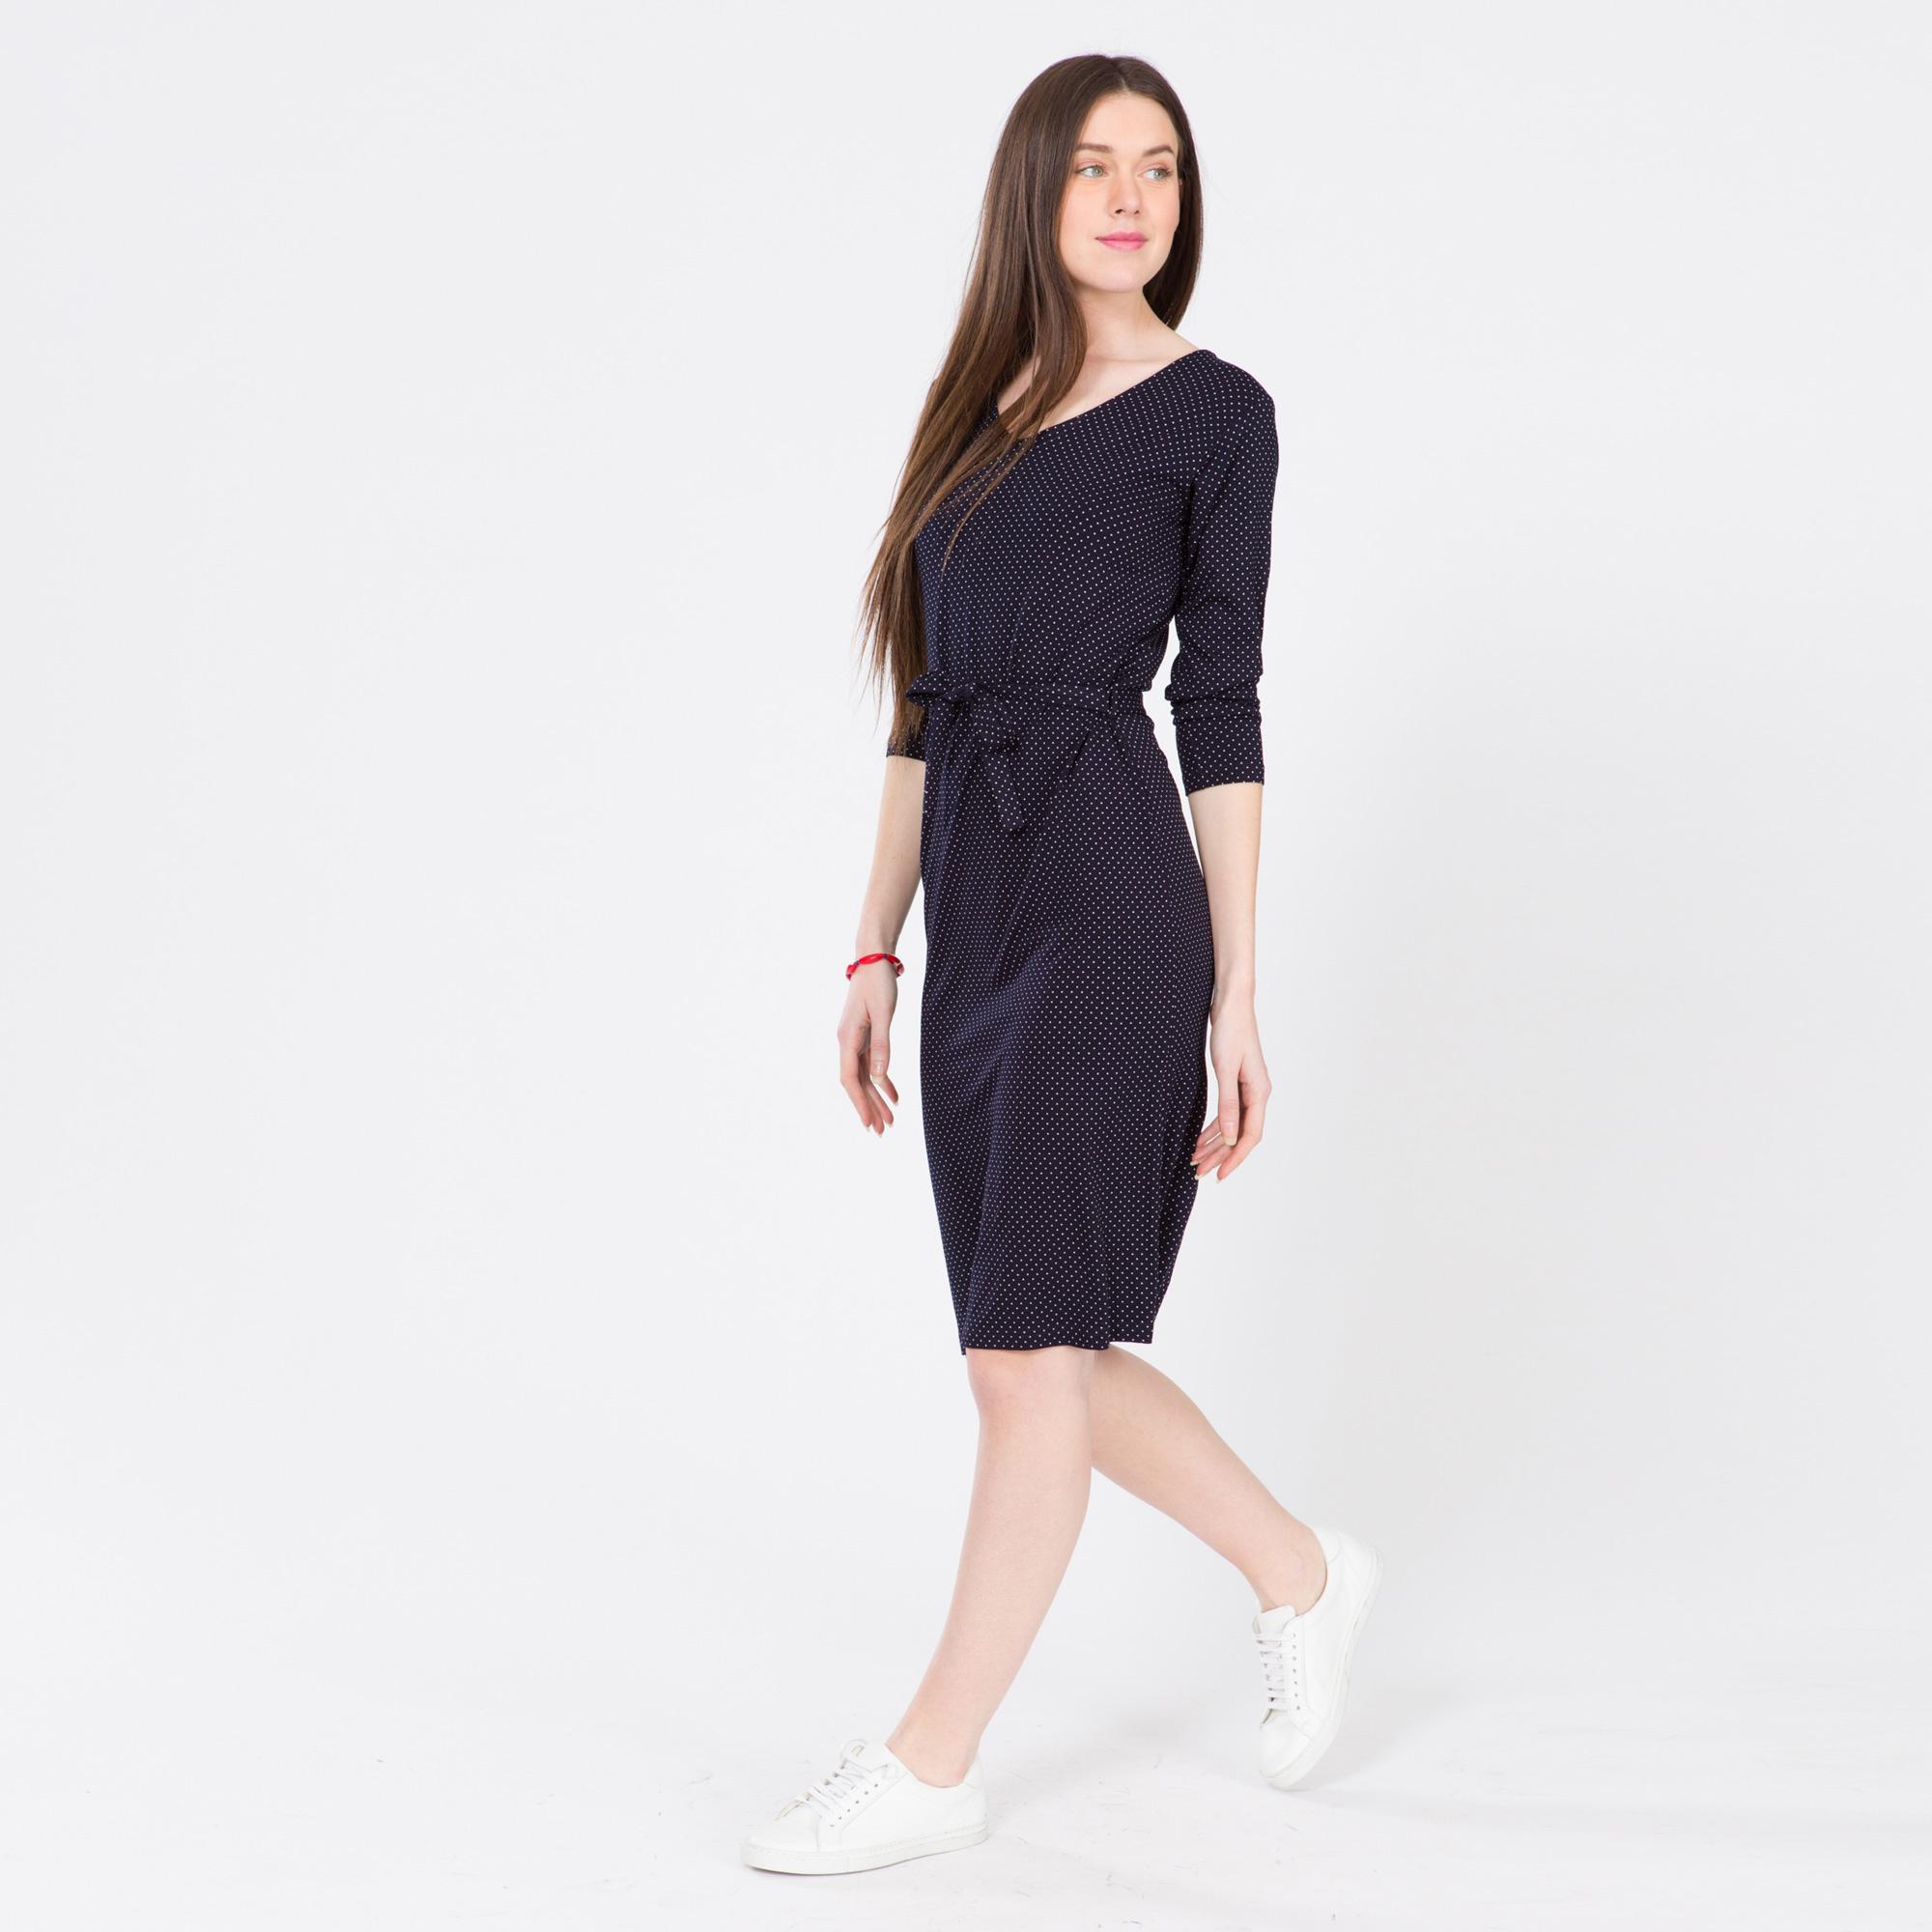 Agnes b black dress neiman